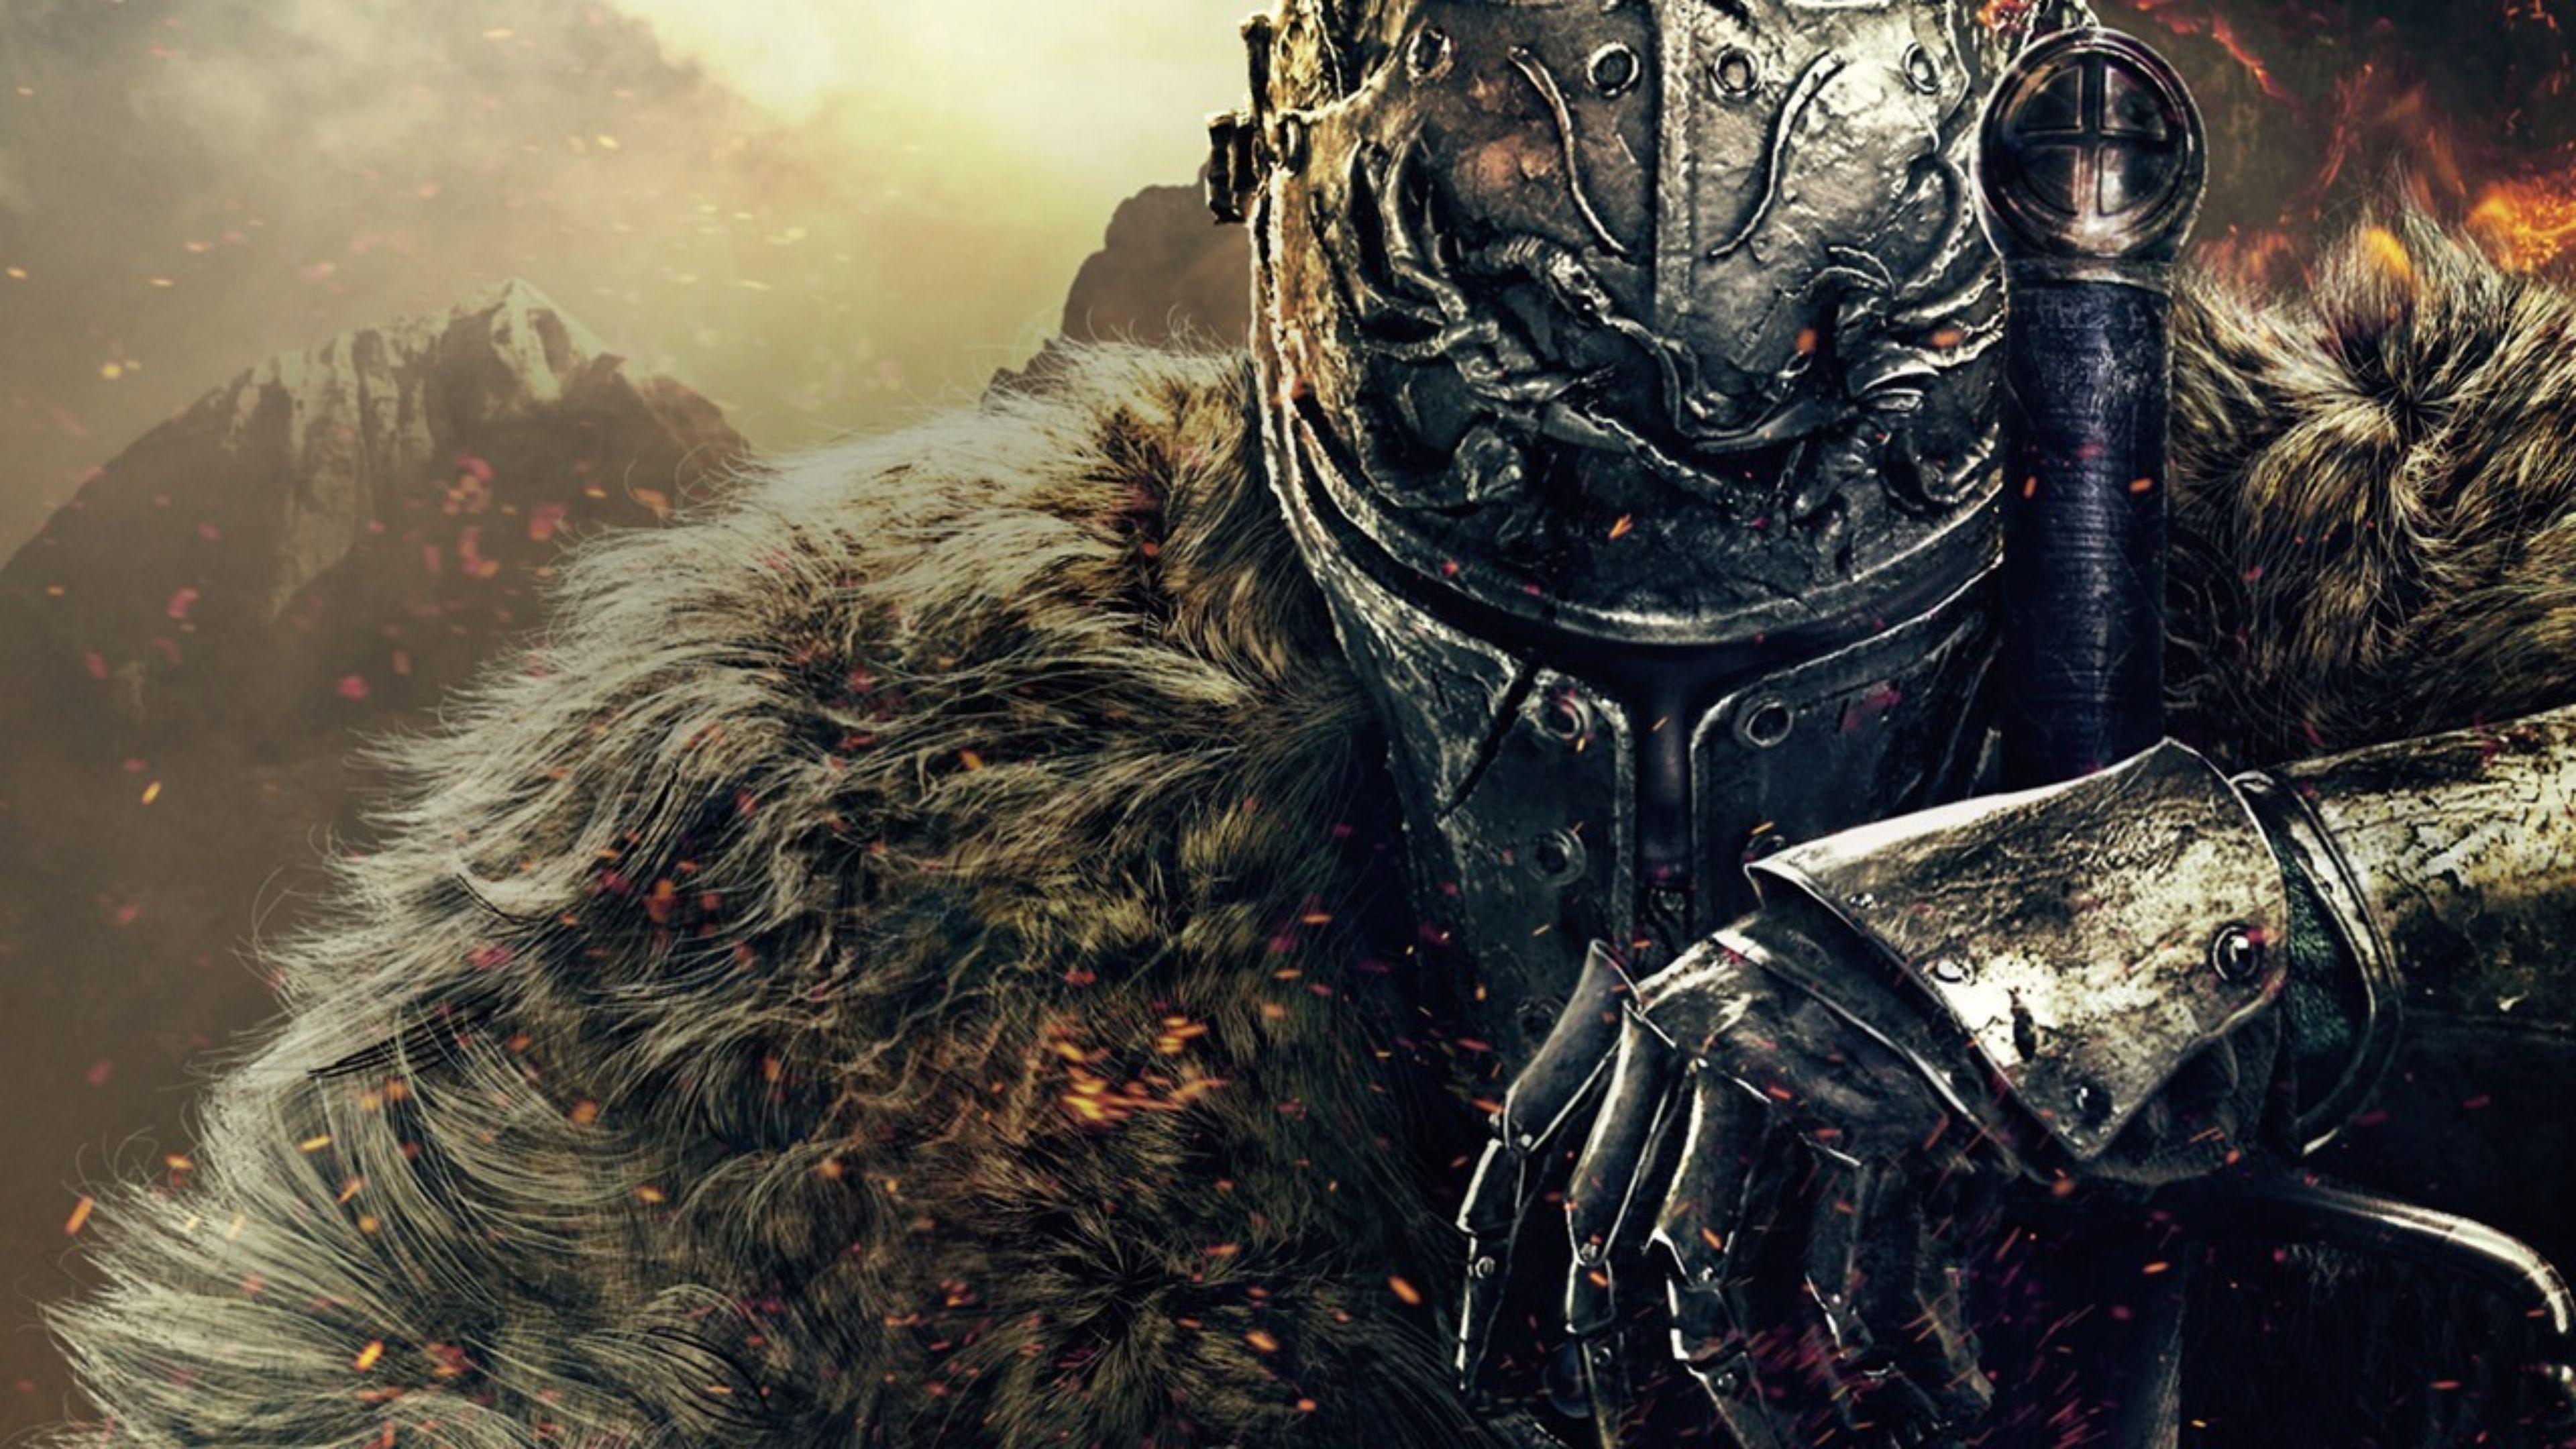 Download Dark Souls III 4K Wallpaper | Free 4K Wallpaper